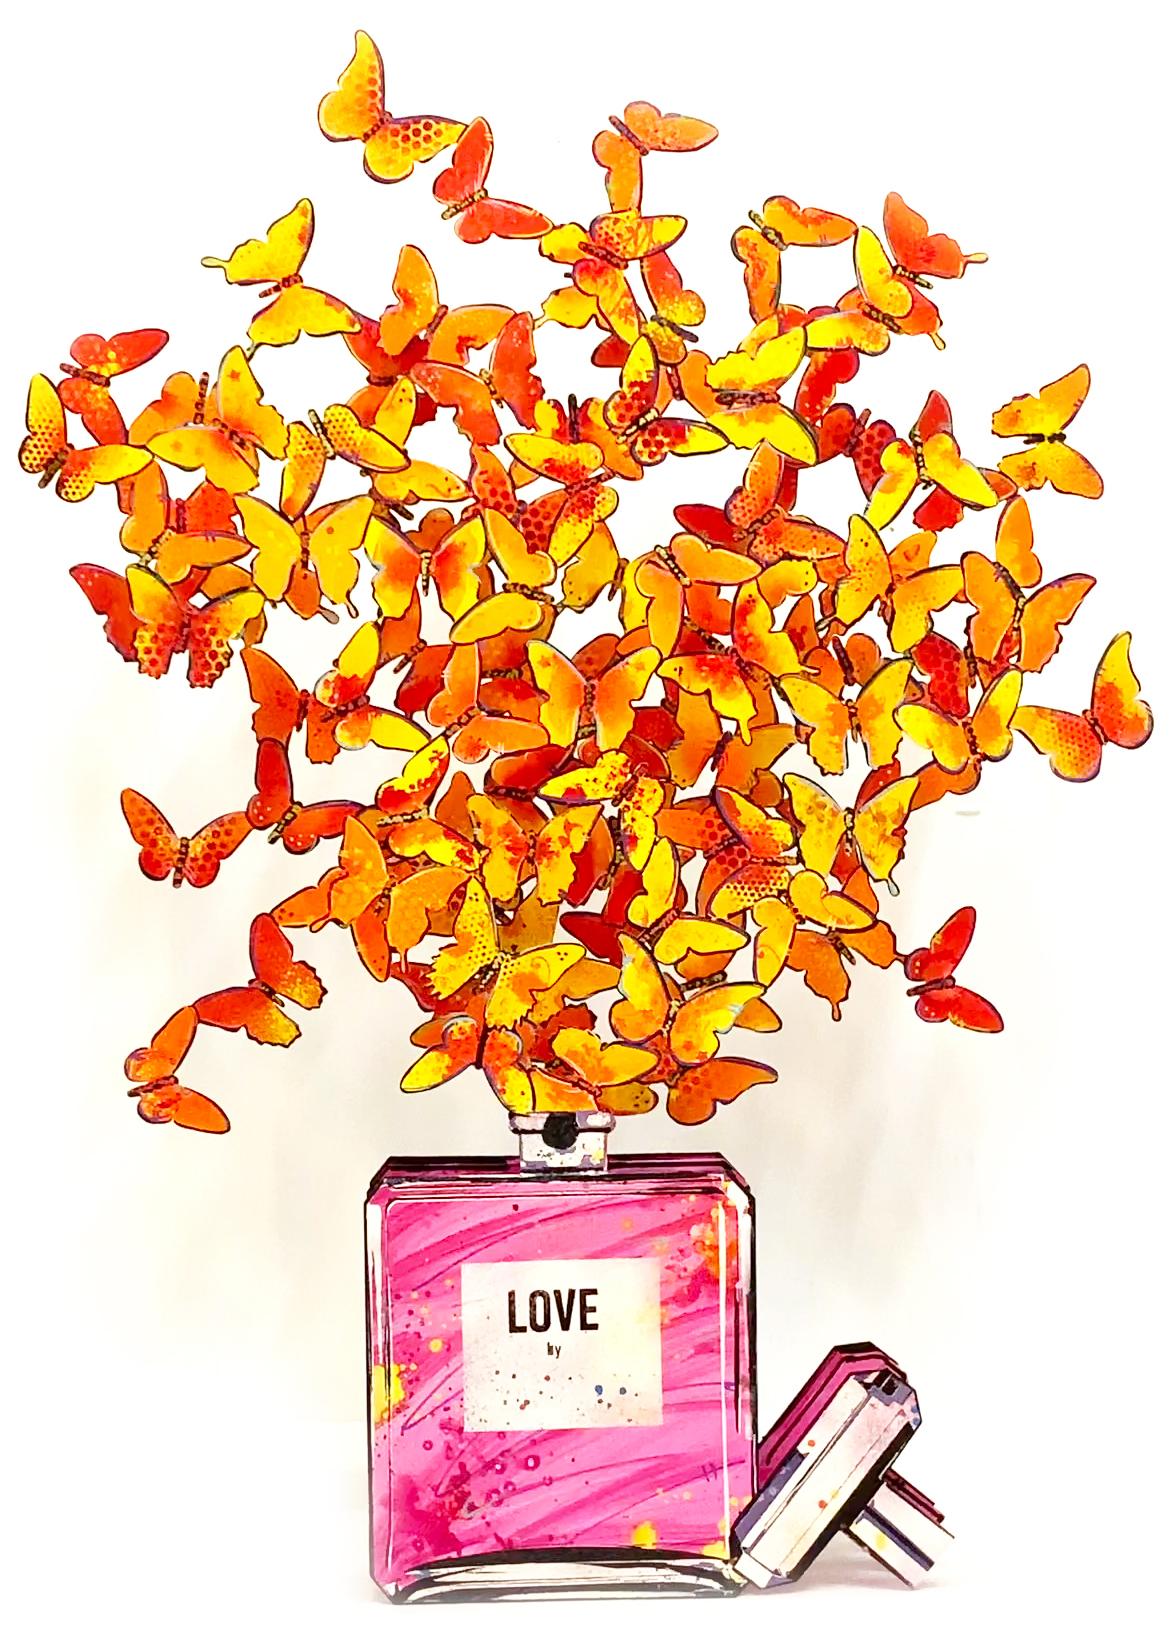 Tom Boston - Love Pink , 8022-006-288